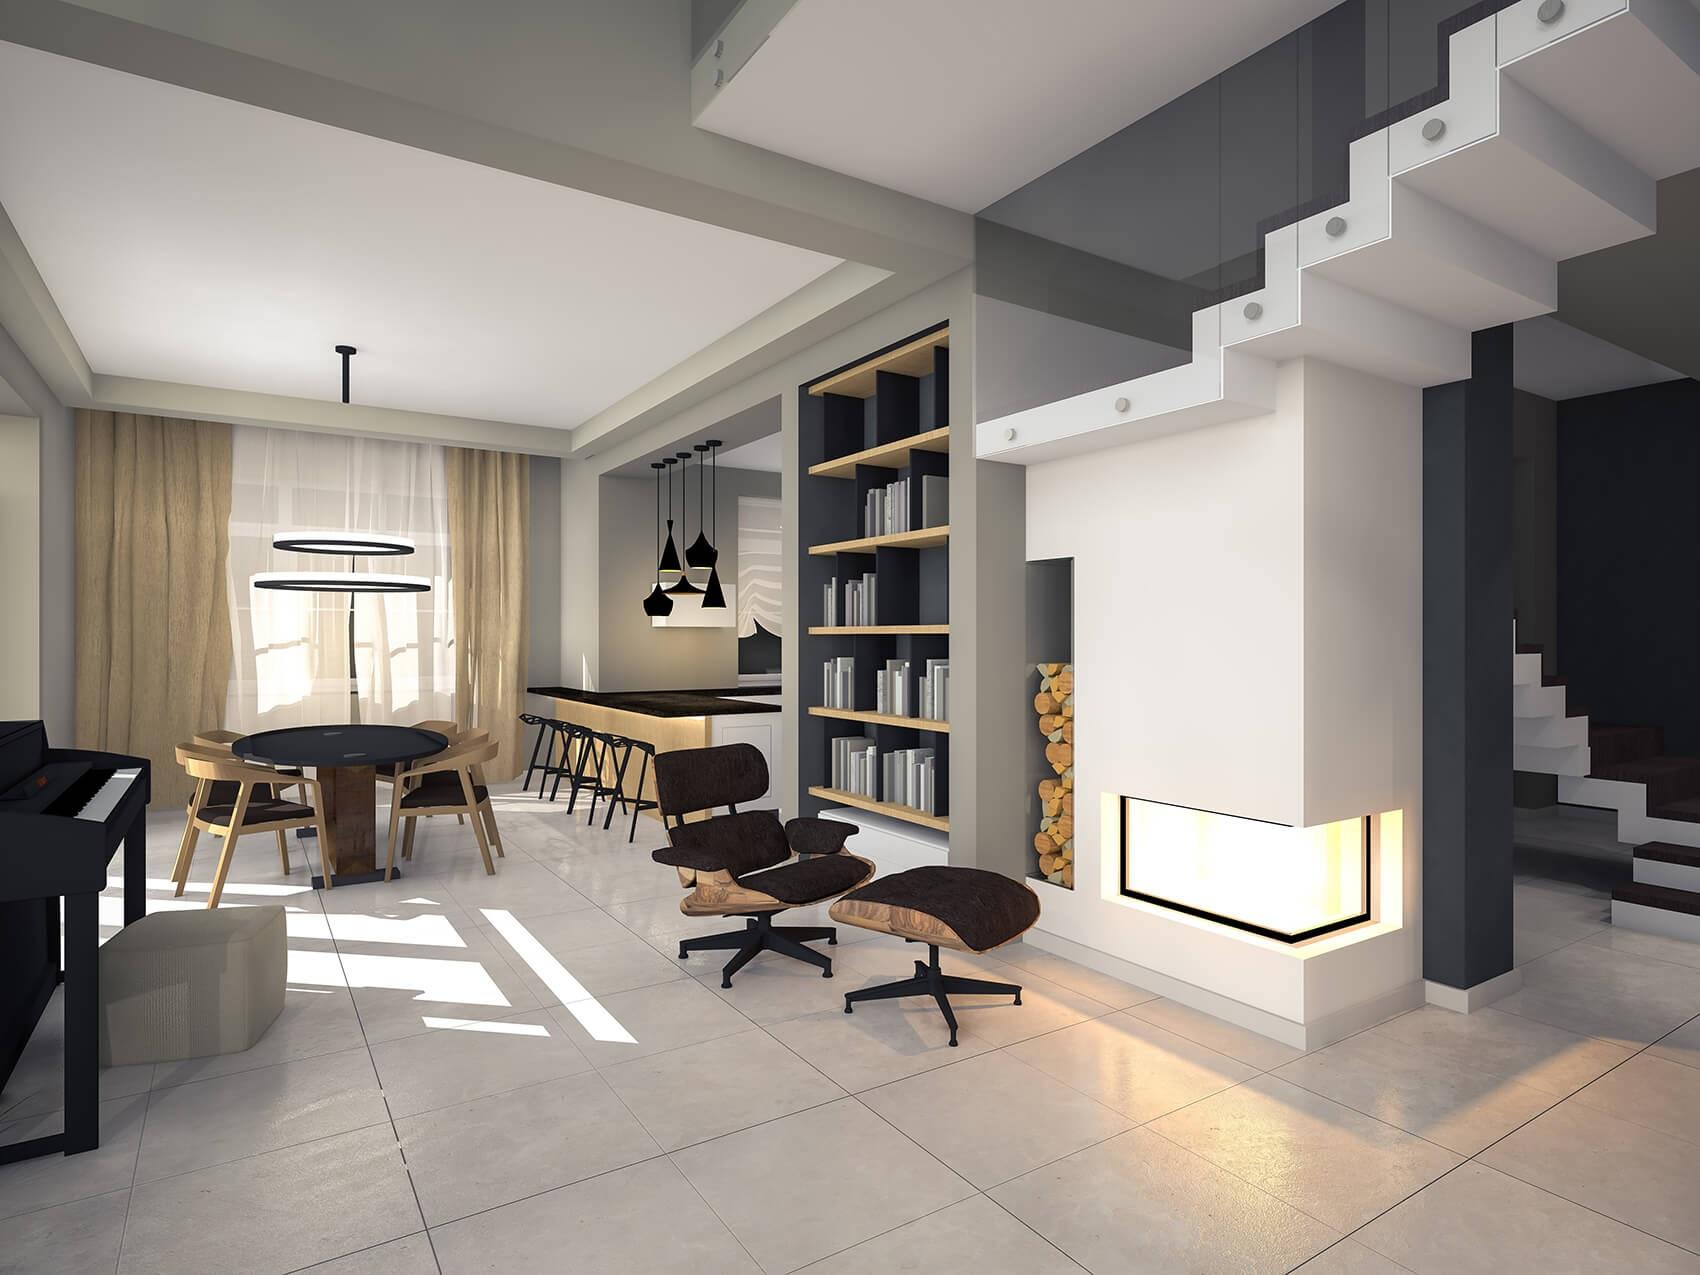 aces chateau apartment interiors10